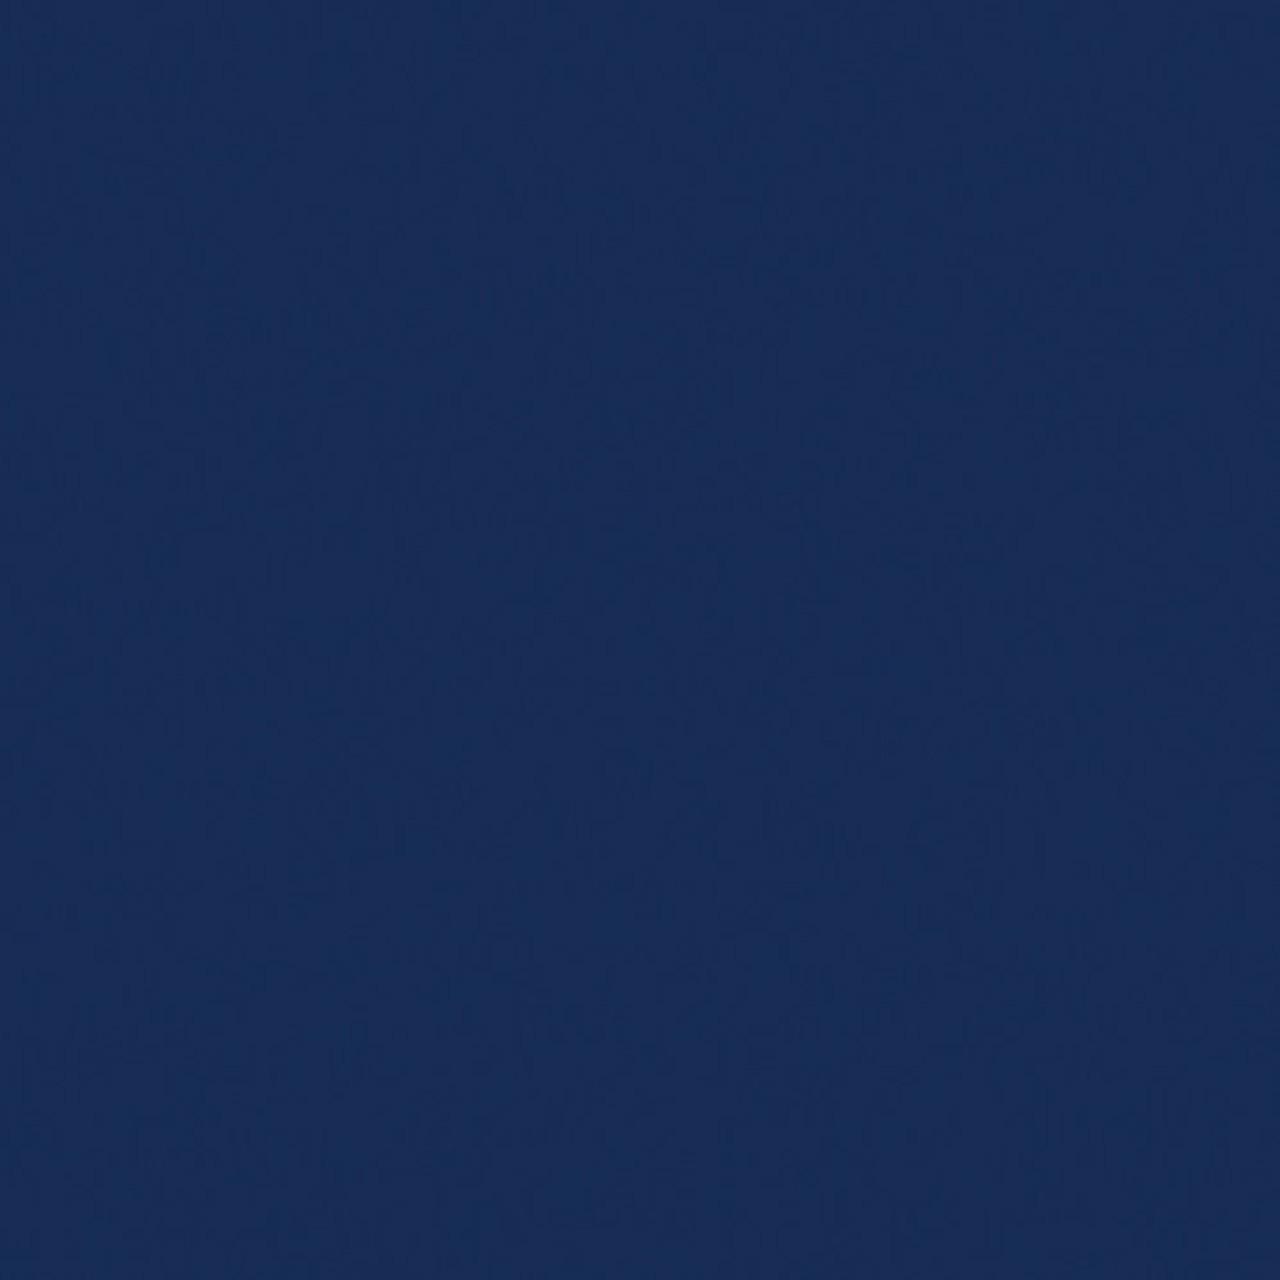 "#0382 Rosco Gels Roscolux Congo Blue, 20x24"""